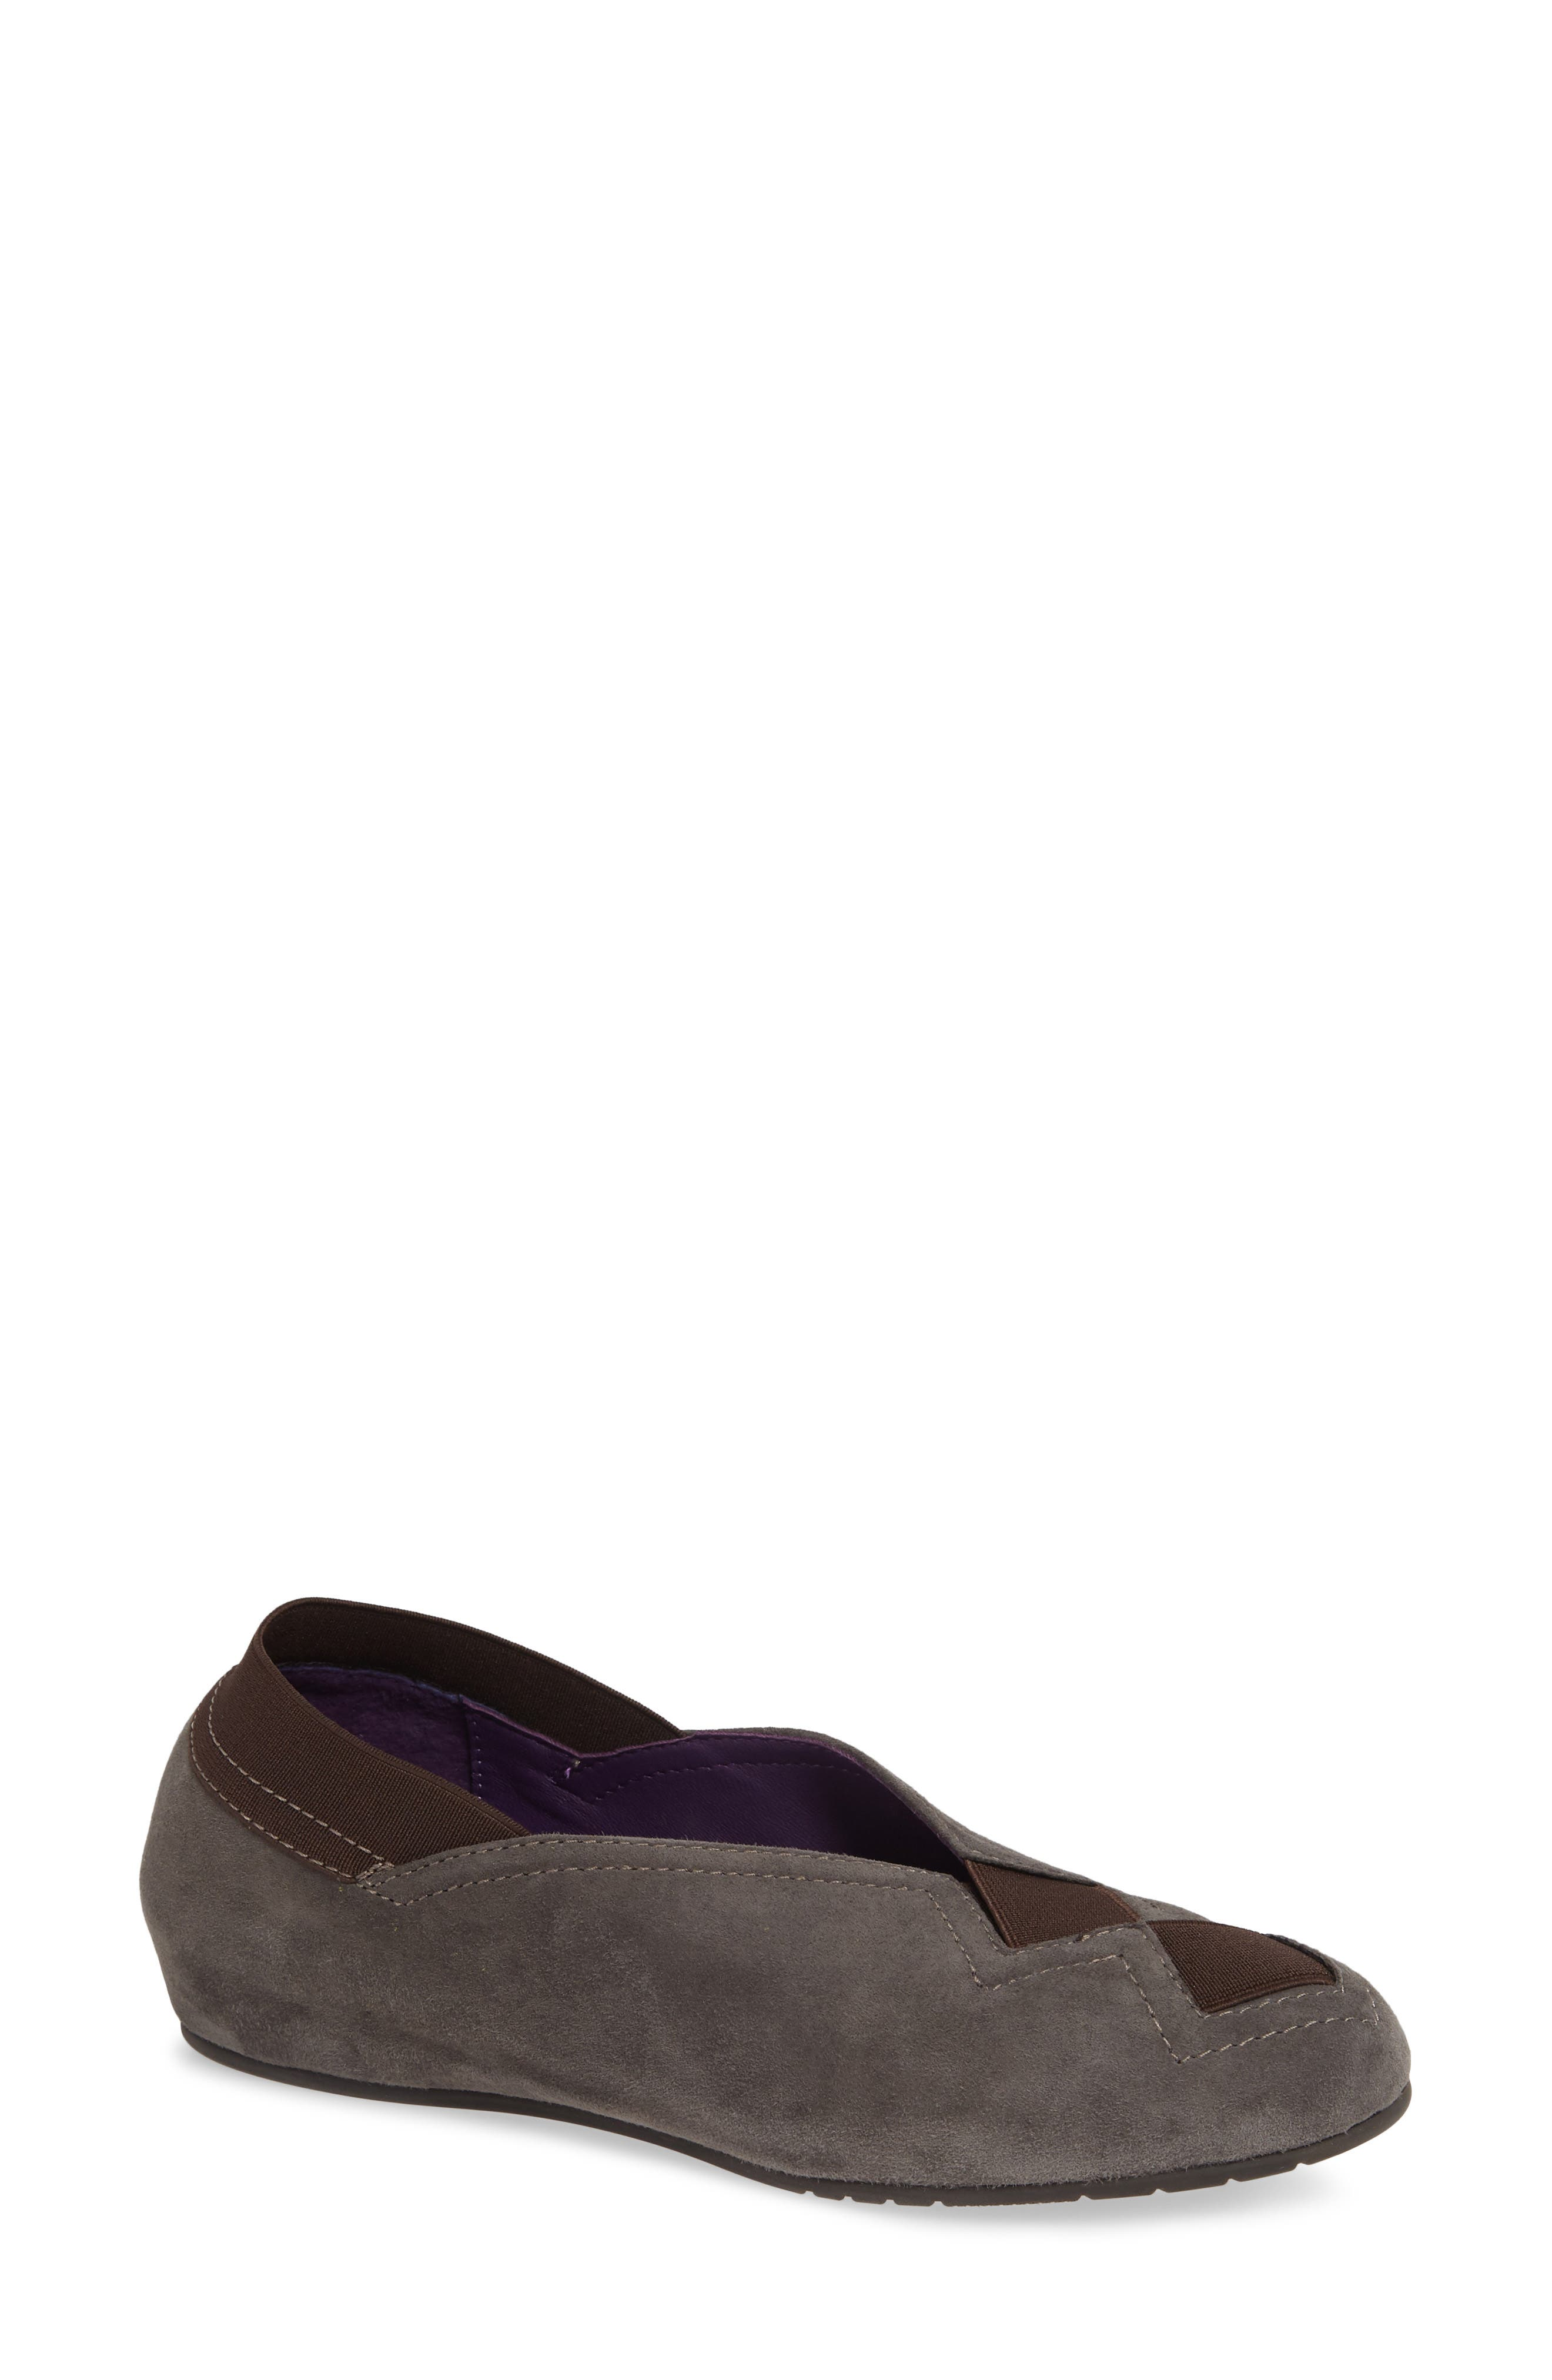 Pandy Hidden Wedge Shoe,                         Main,                         color, MOUSSE SUEDE